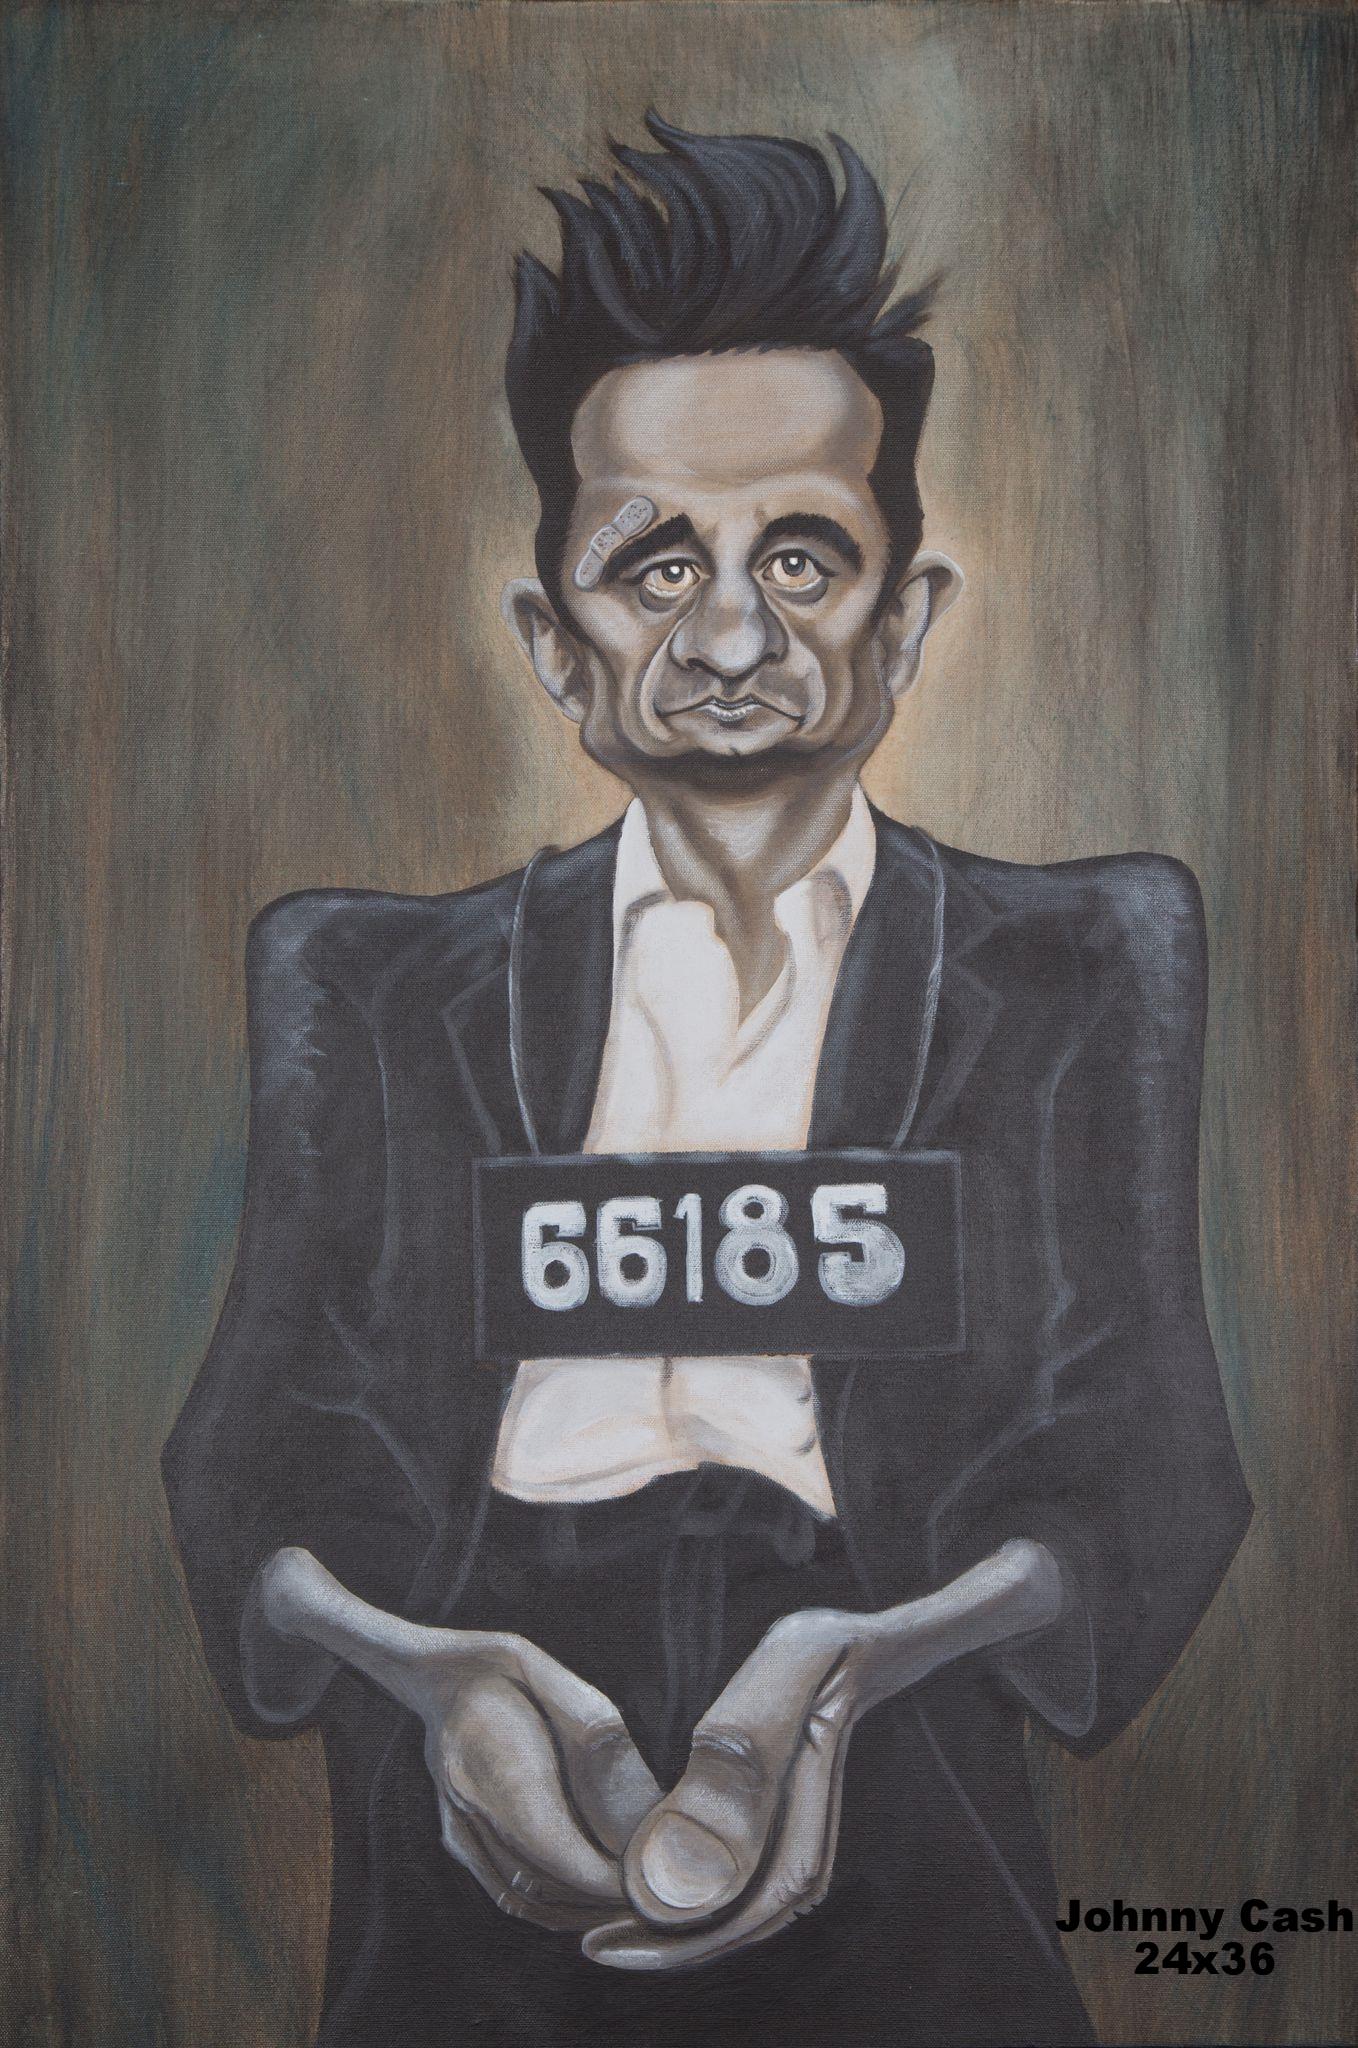 Johnny Cash 24 x 36.jpeg